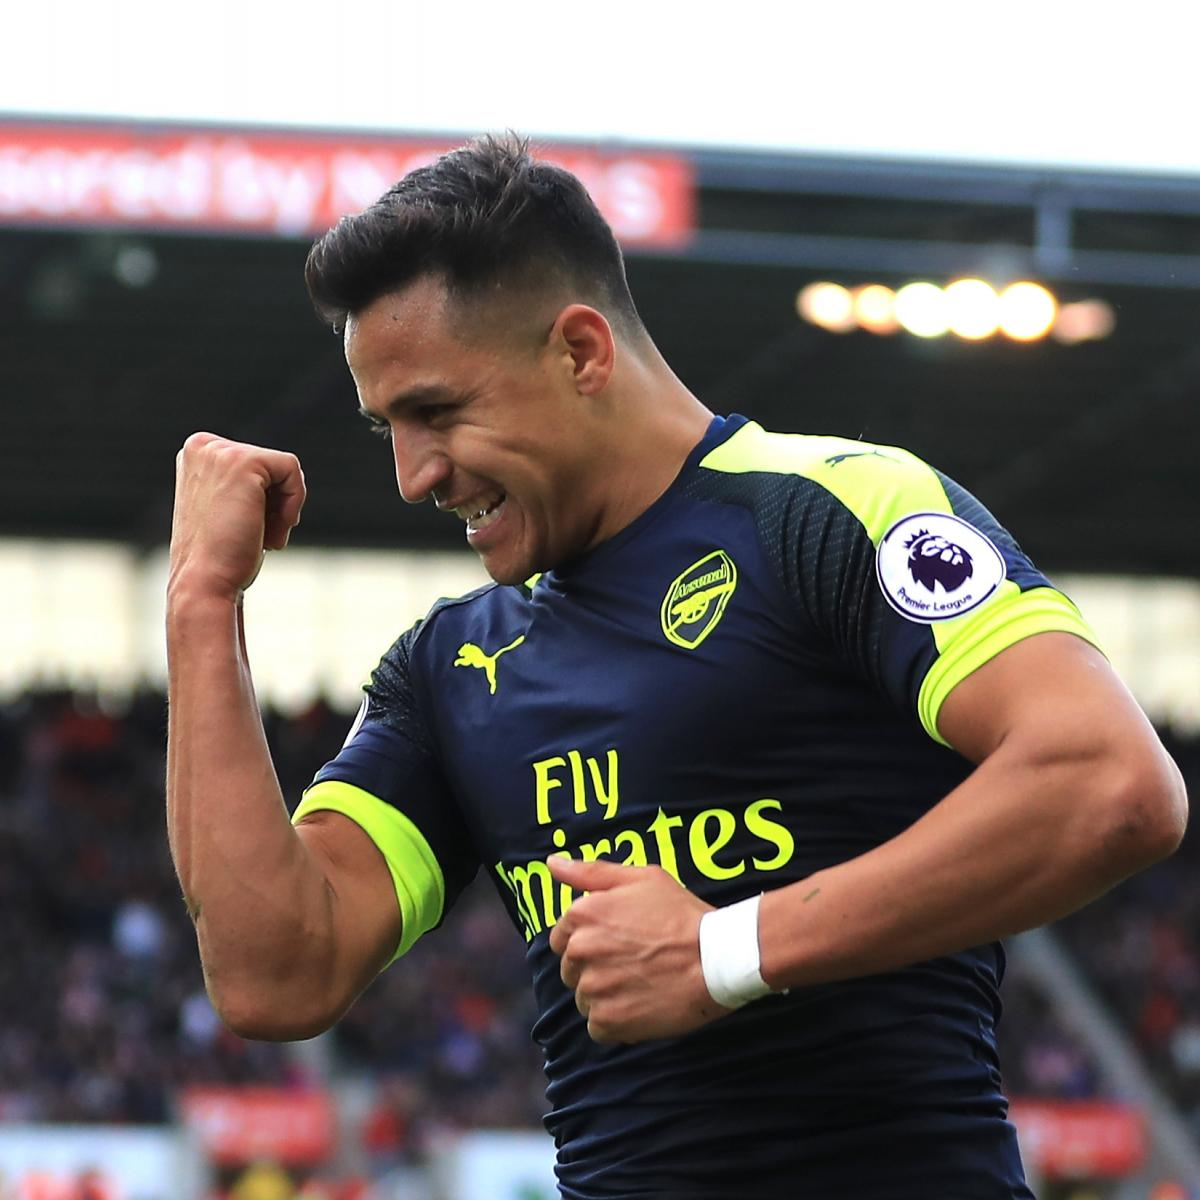 Manchester United Transfer News Alexis Sanchez Rumours: Arsenal Transfer News: Alexis Sanchez 'Welcome' At PSG